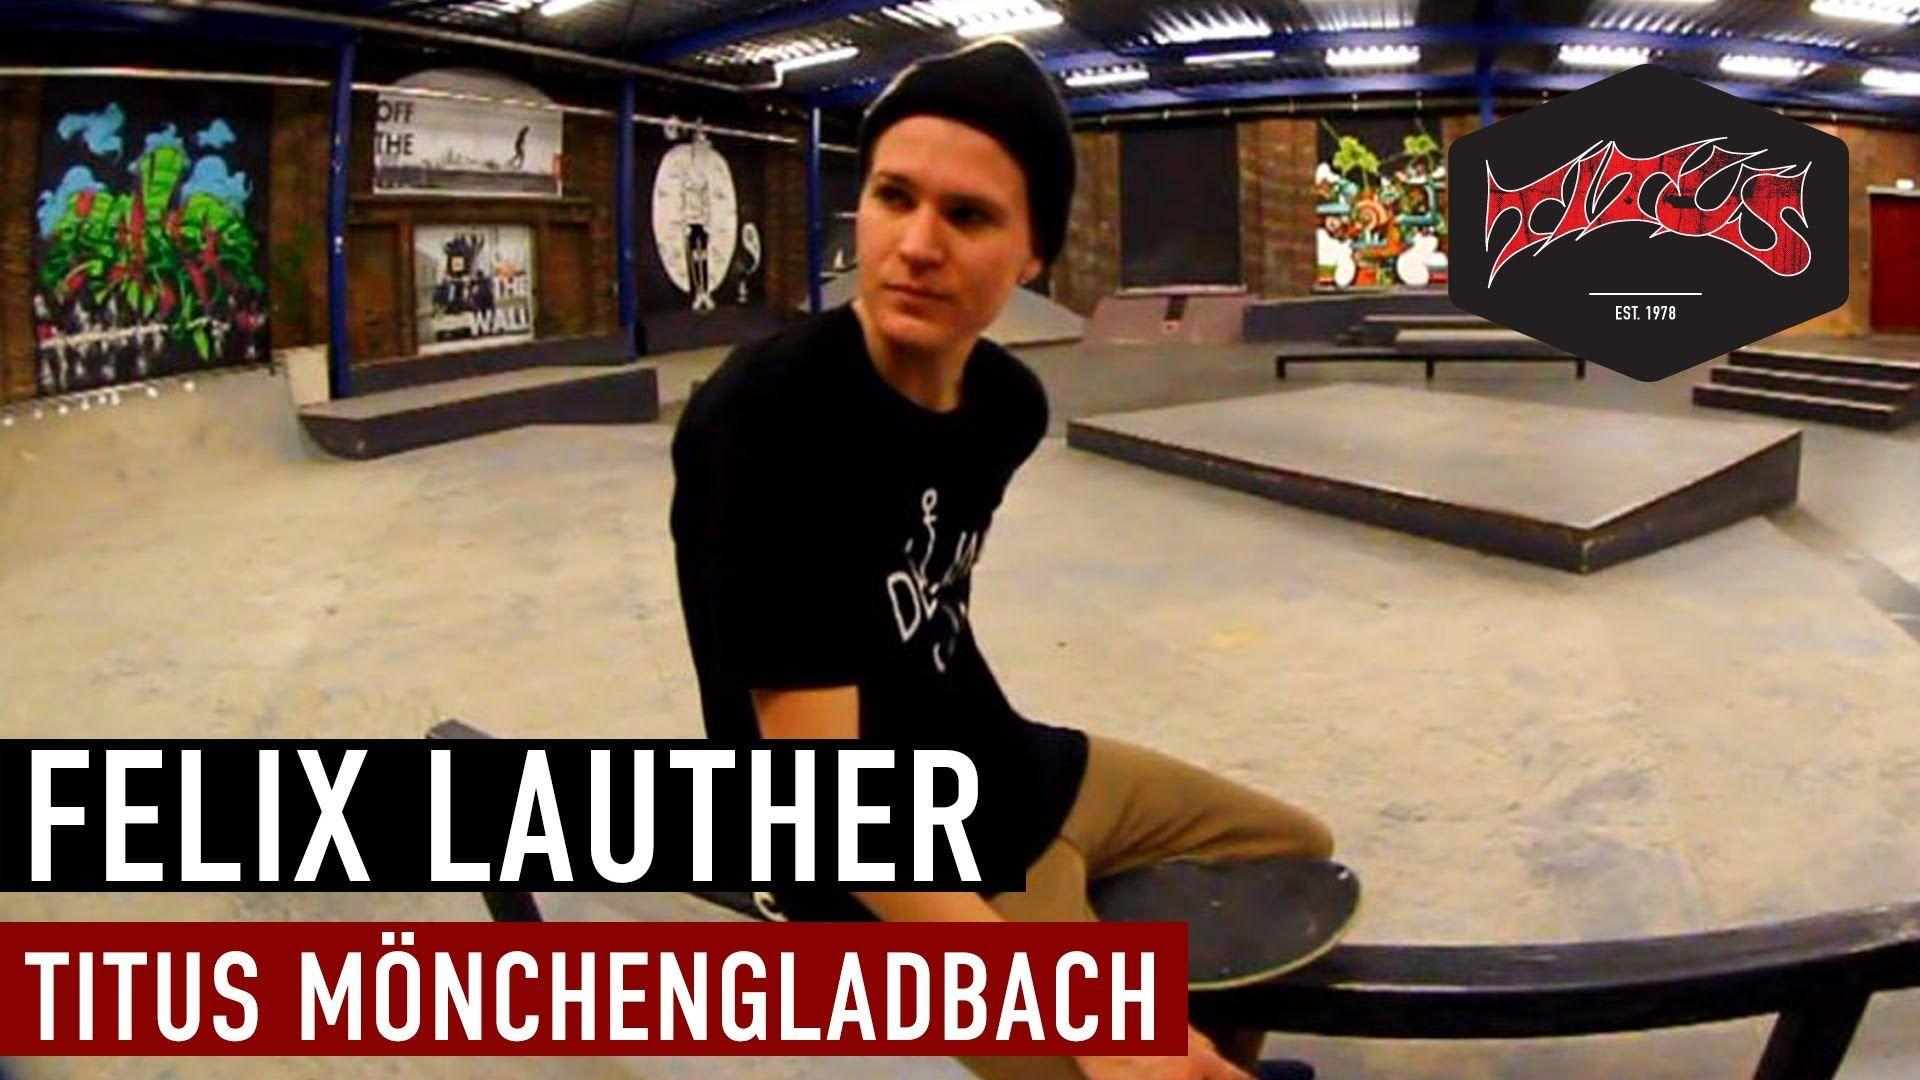 Titus Mönchengladbach welcomes Felix Lauther - http://DAILYSKATETUBE.COM/titus-monchengladbach-welcomes-felix-lauther/ -   http://www.facebook.com/titus http://instagram.com/titus http://www.titus.de/moenchengladbach Das Titus Shop Team aus Mönchengladbach bekommt mit Felix Lauth... - felix, Lauther, Mönchengladbach, Titus, WELCOMES